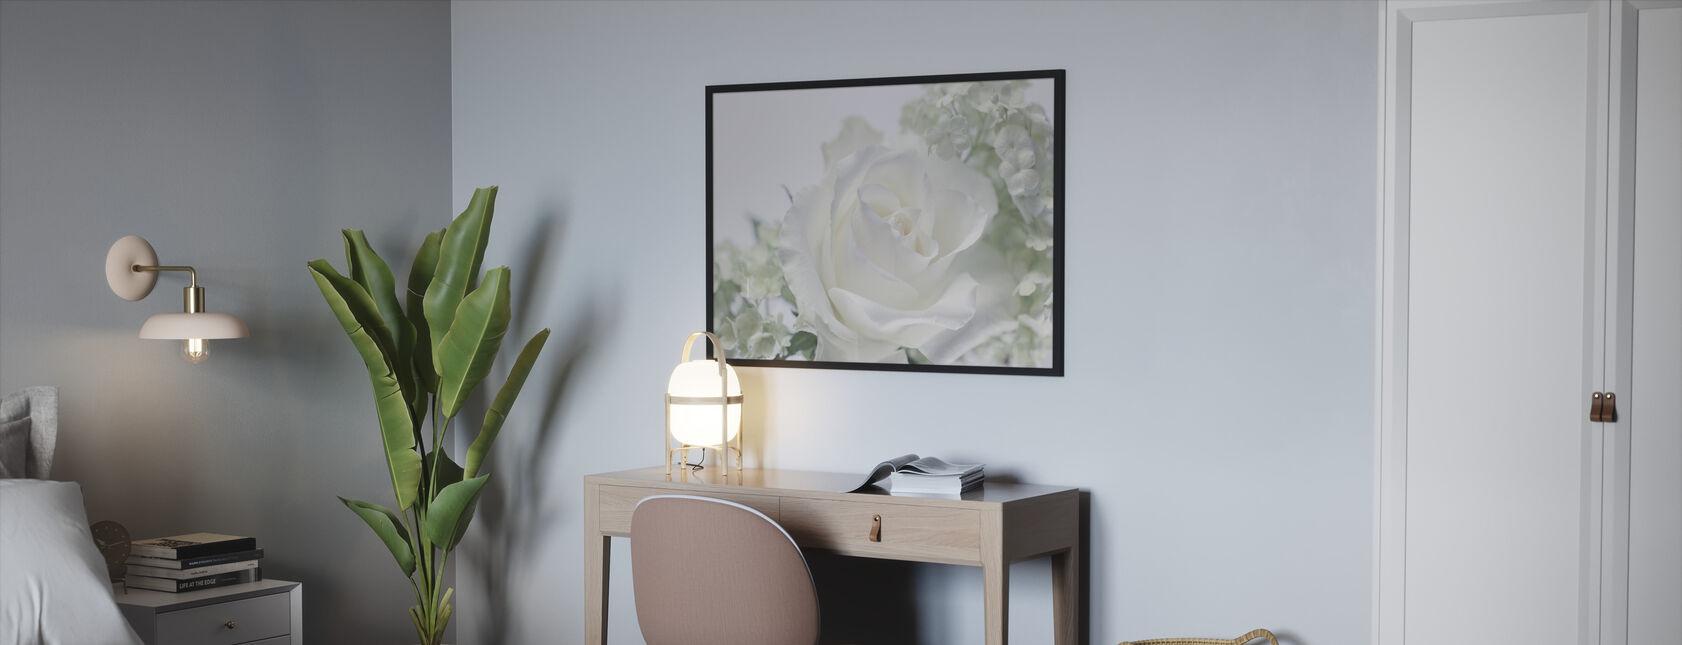 Whtie Rose II - Framed print - Bedroom